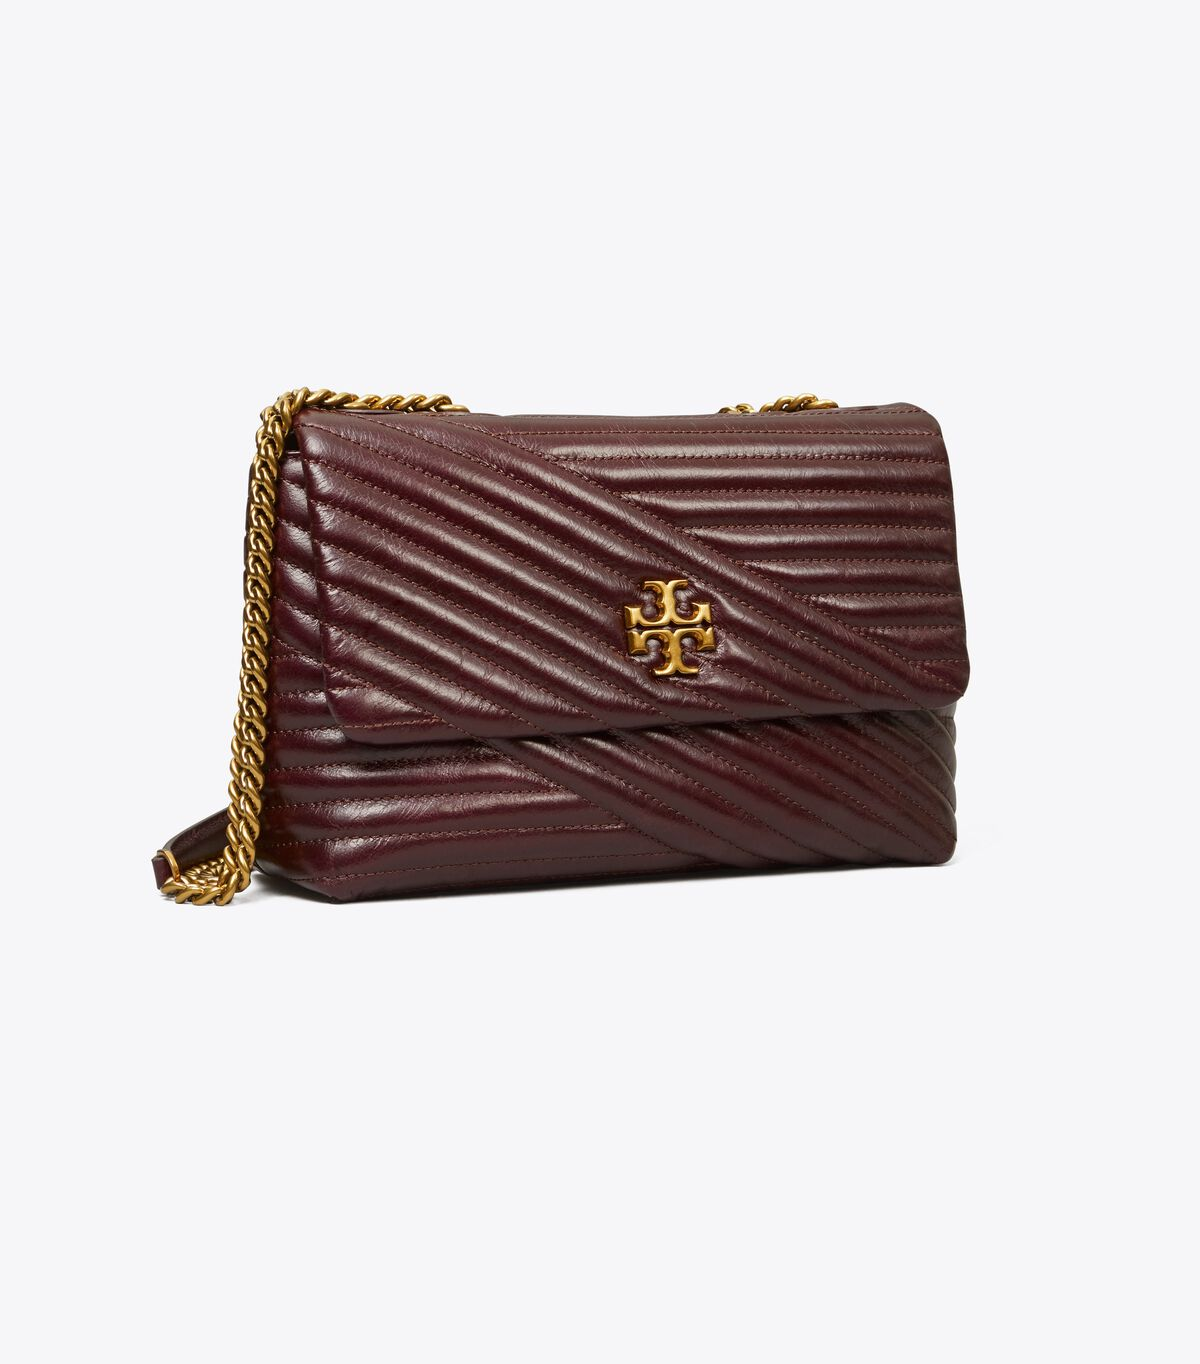 Kira Chevron Glazed Small Convertible Shoulder Bag